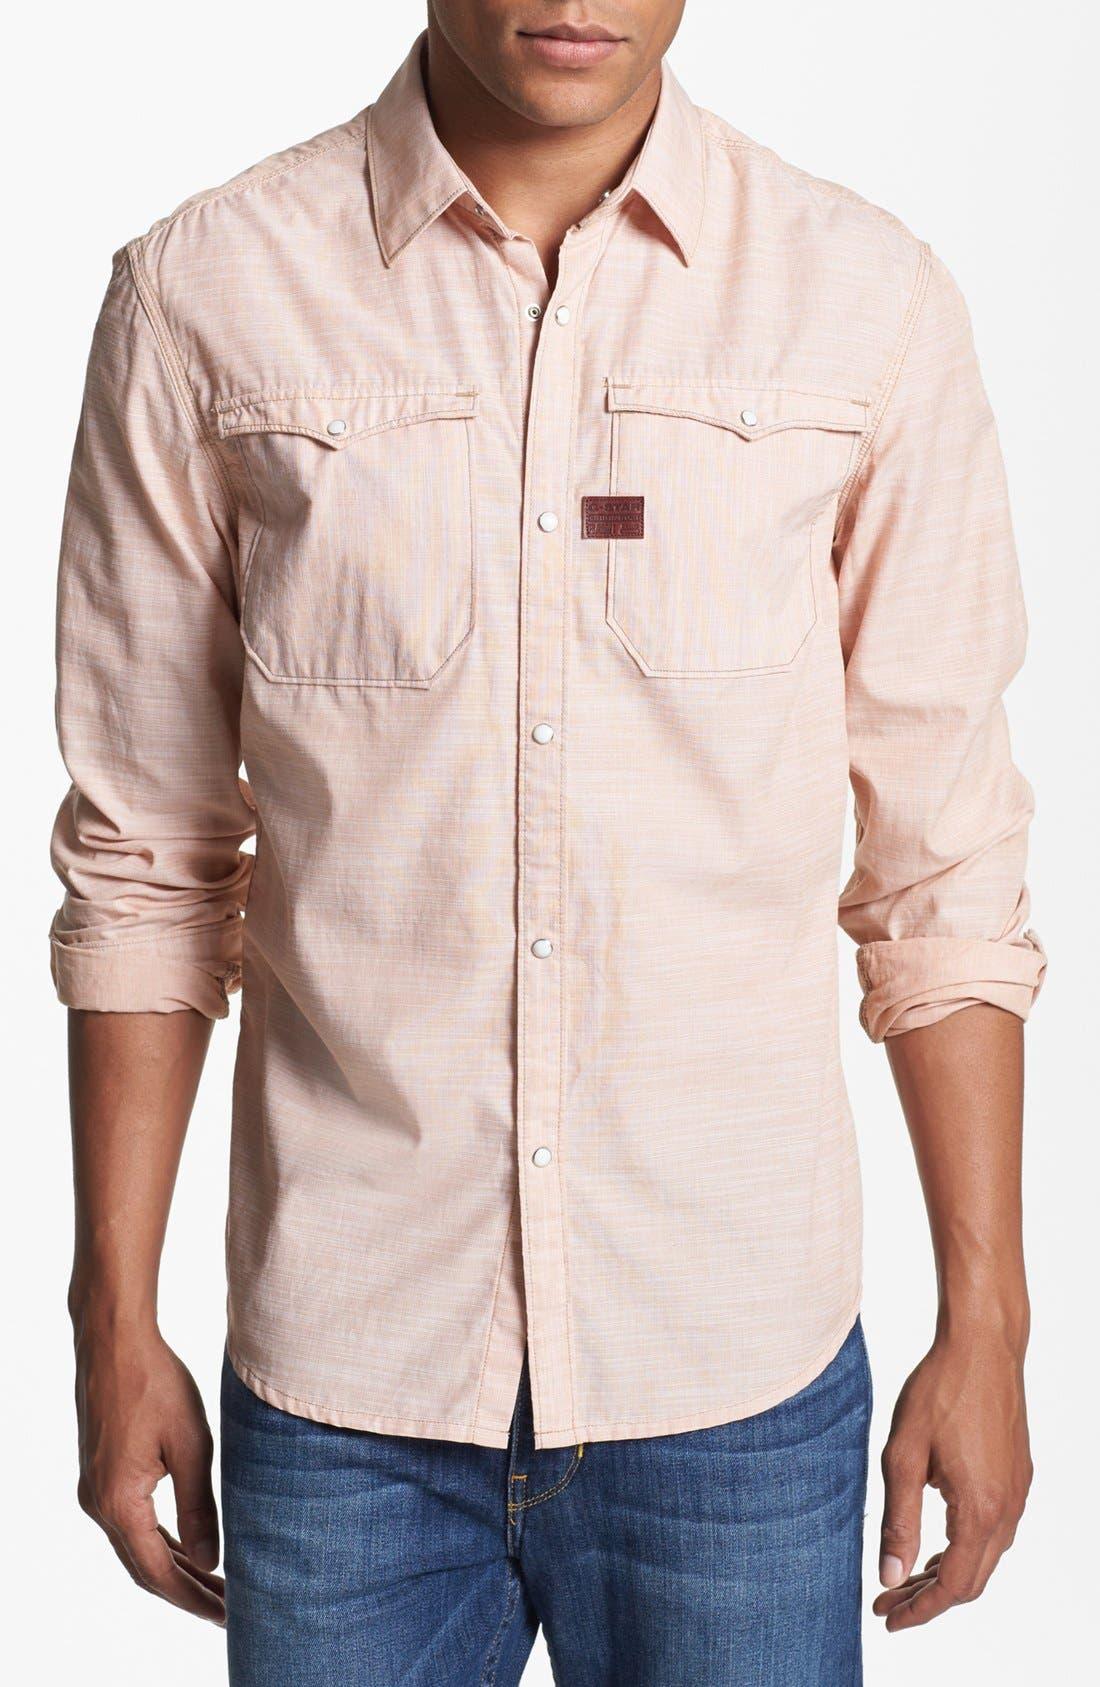 Alternate Image 1 Selected - G-Star Raw 'Hunter' Western Denim Shirt